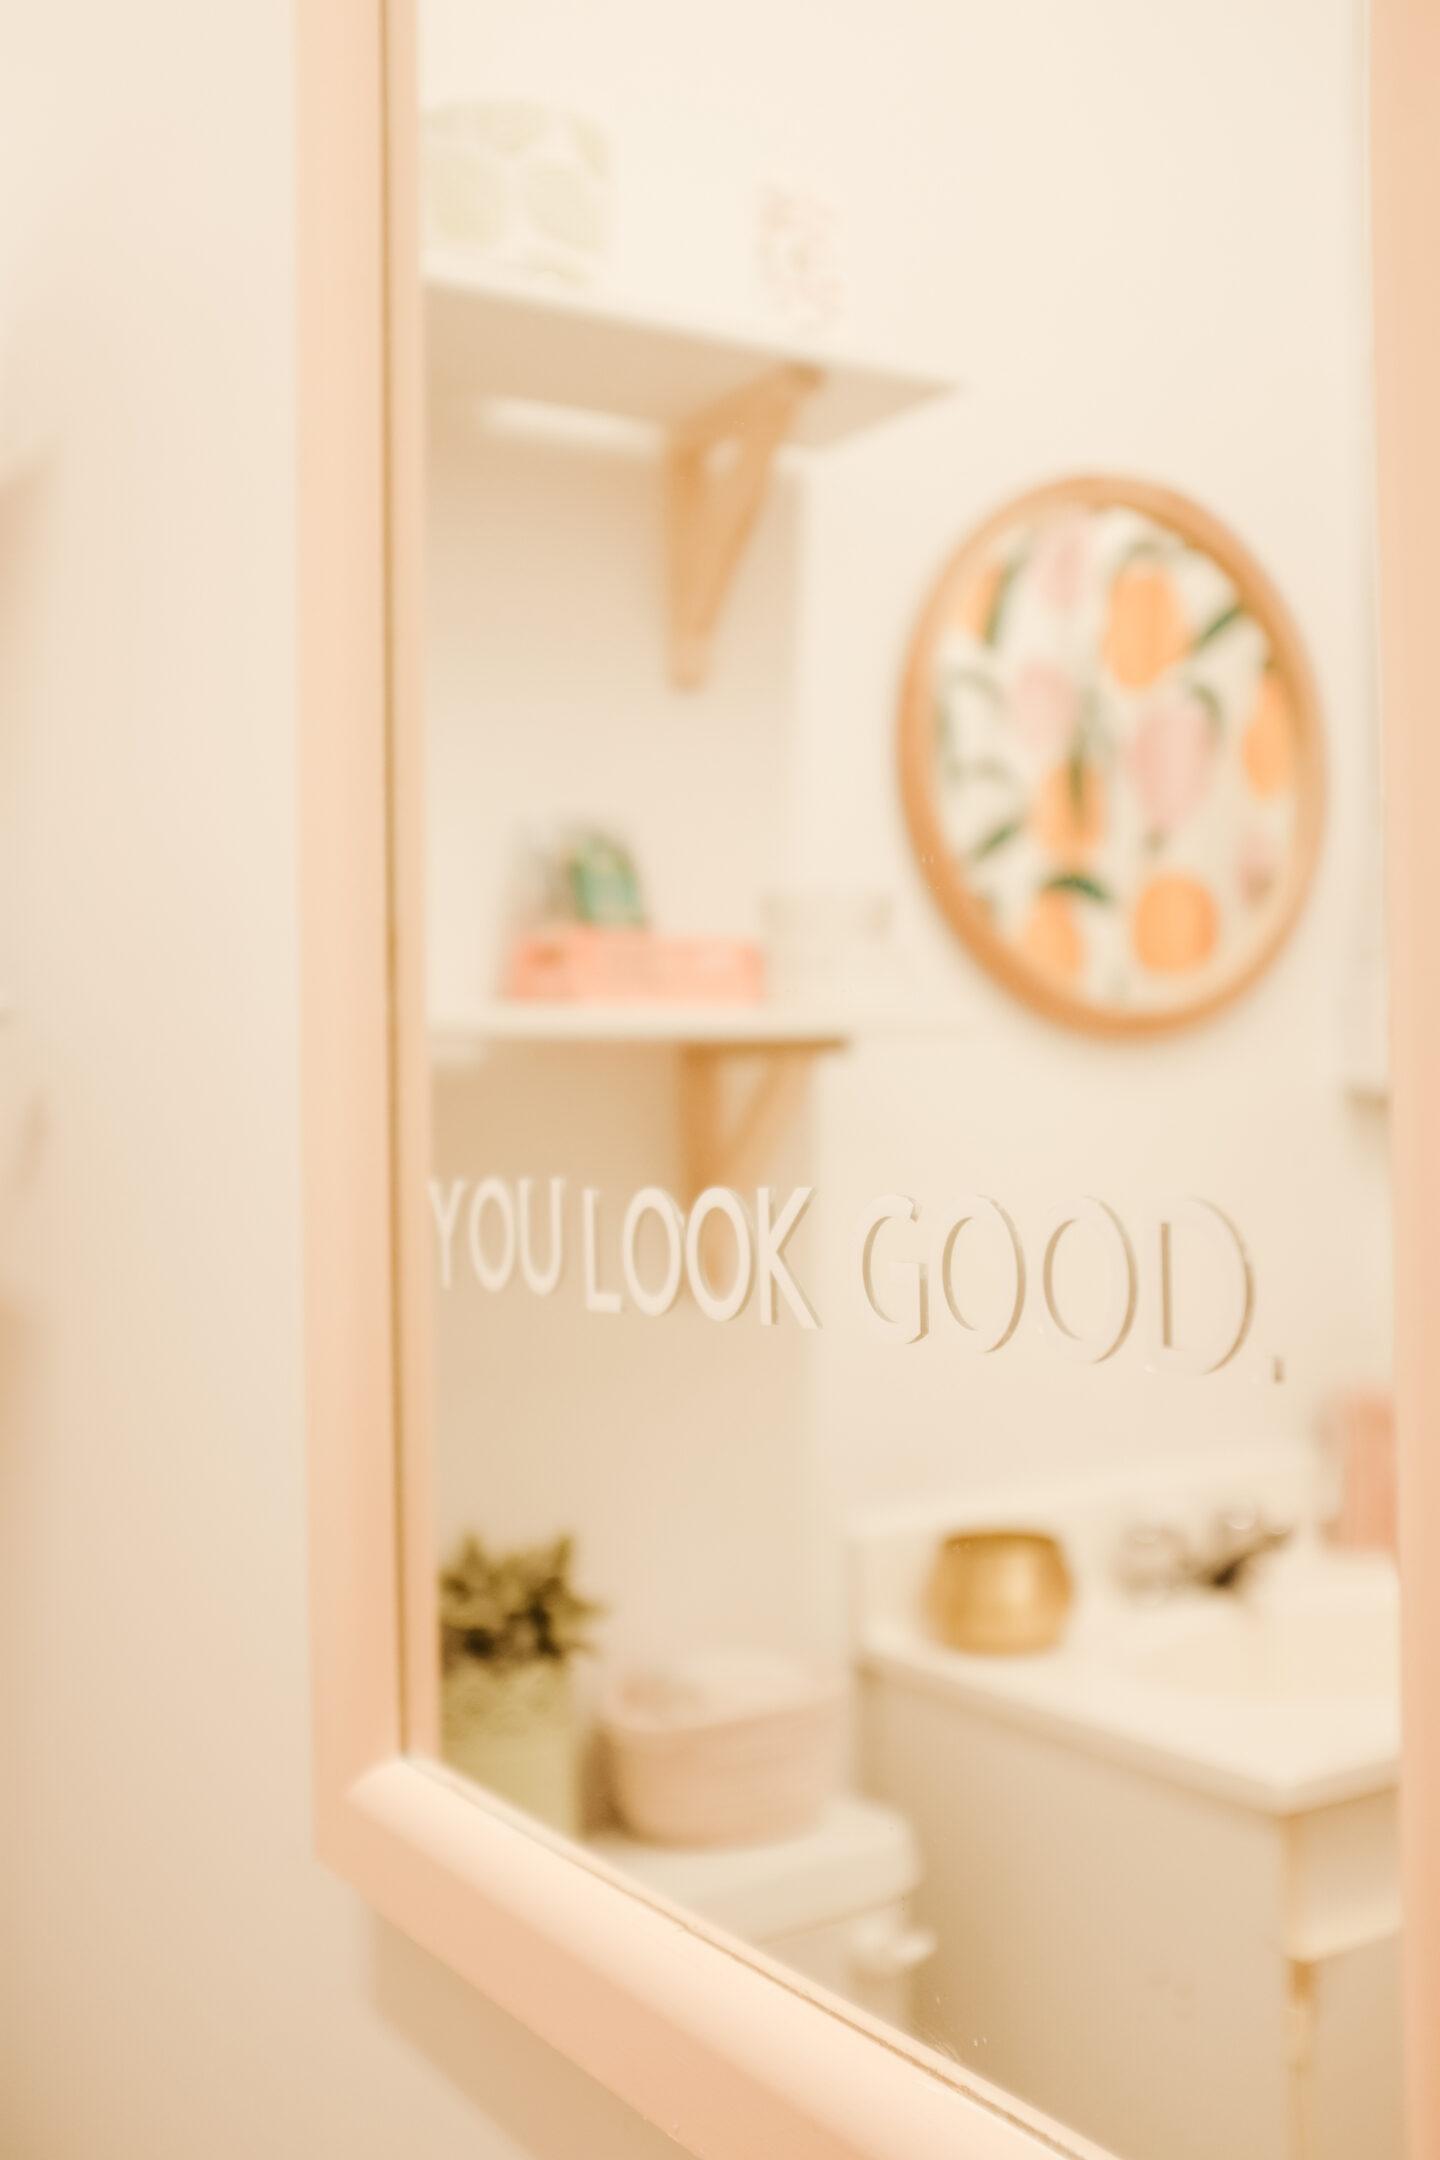 Glossier Mirror DIY tutorial